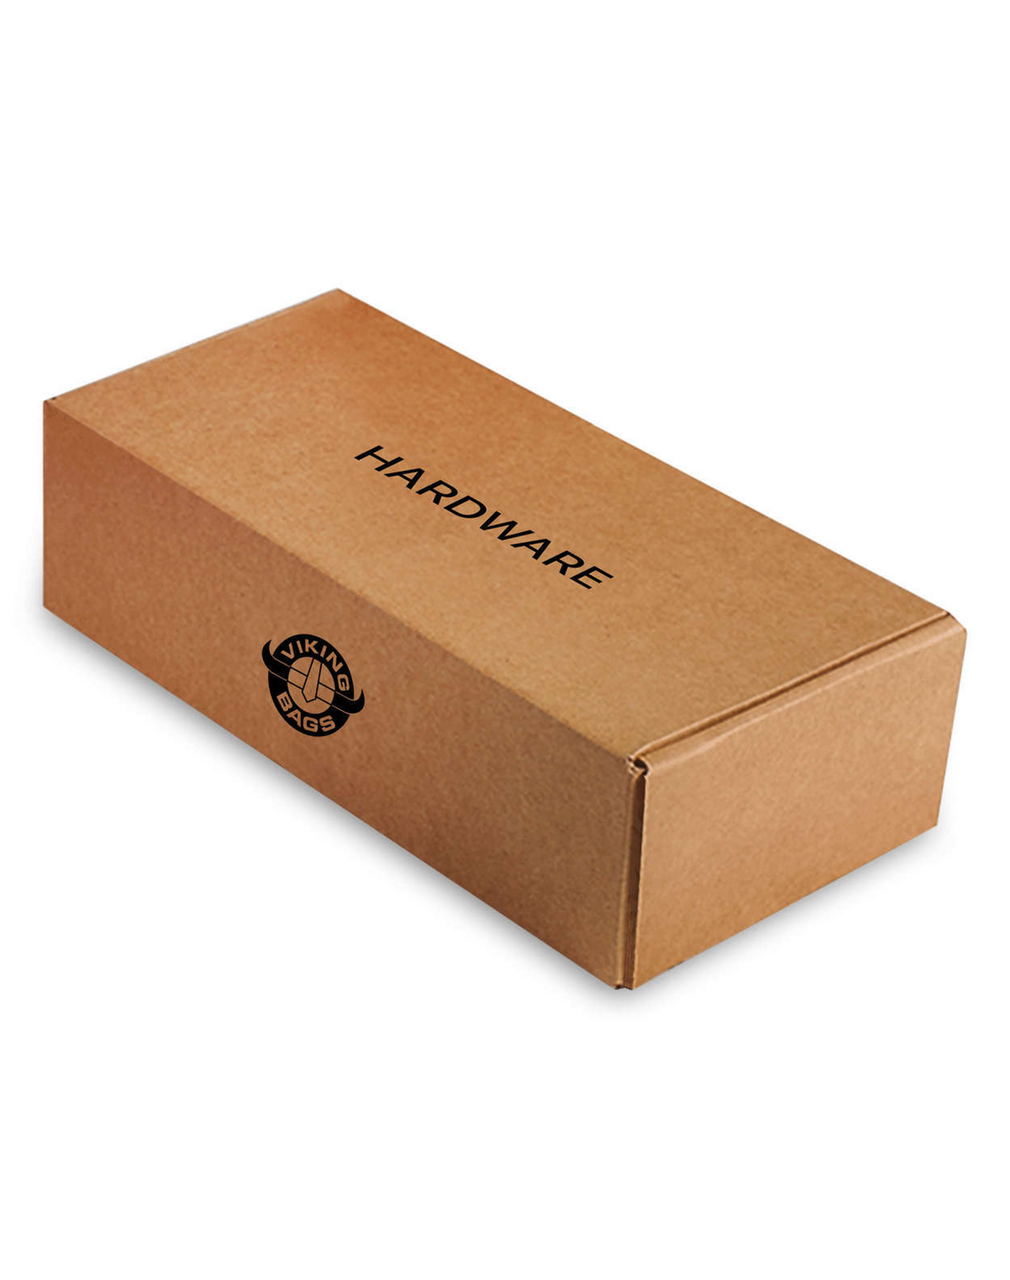 Triumph Thunderbird Warrior Series Motorcycle Saddlebags Box